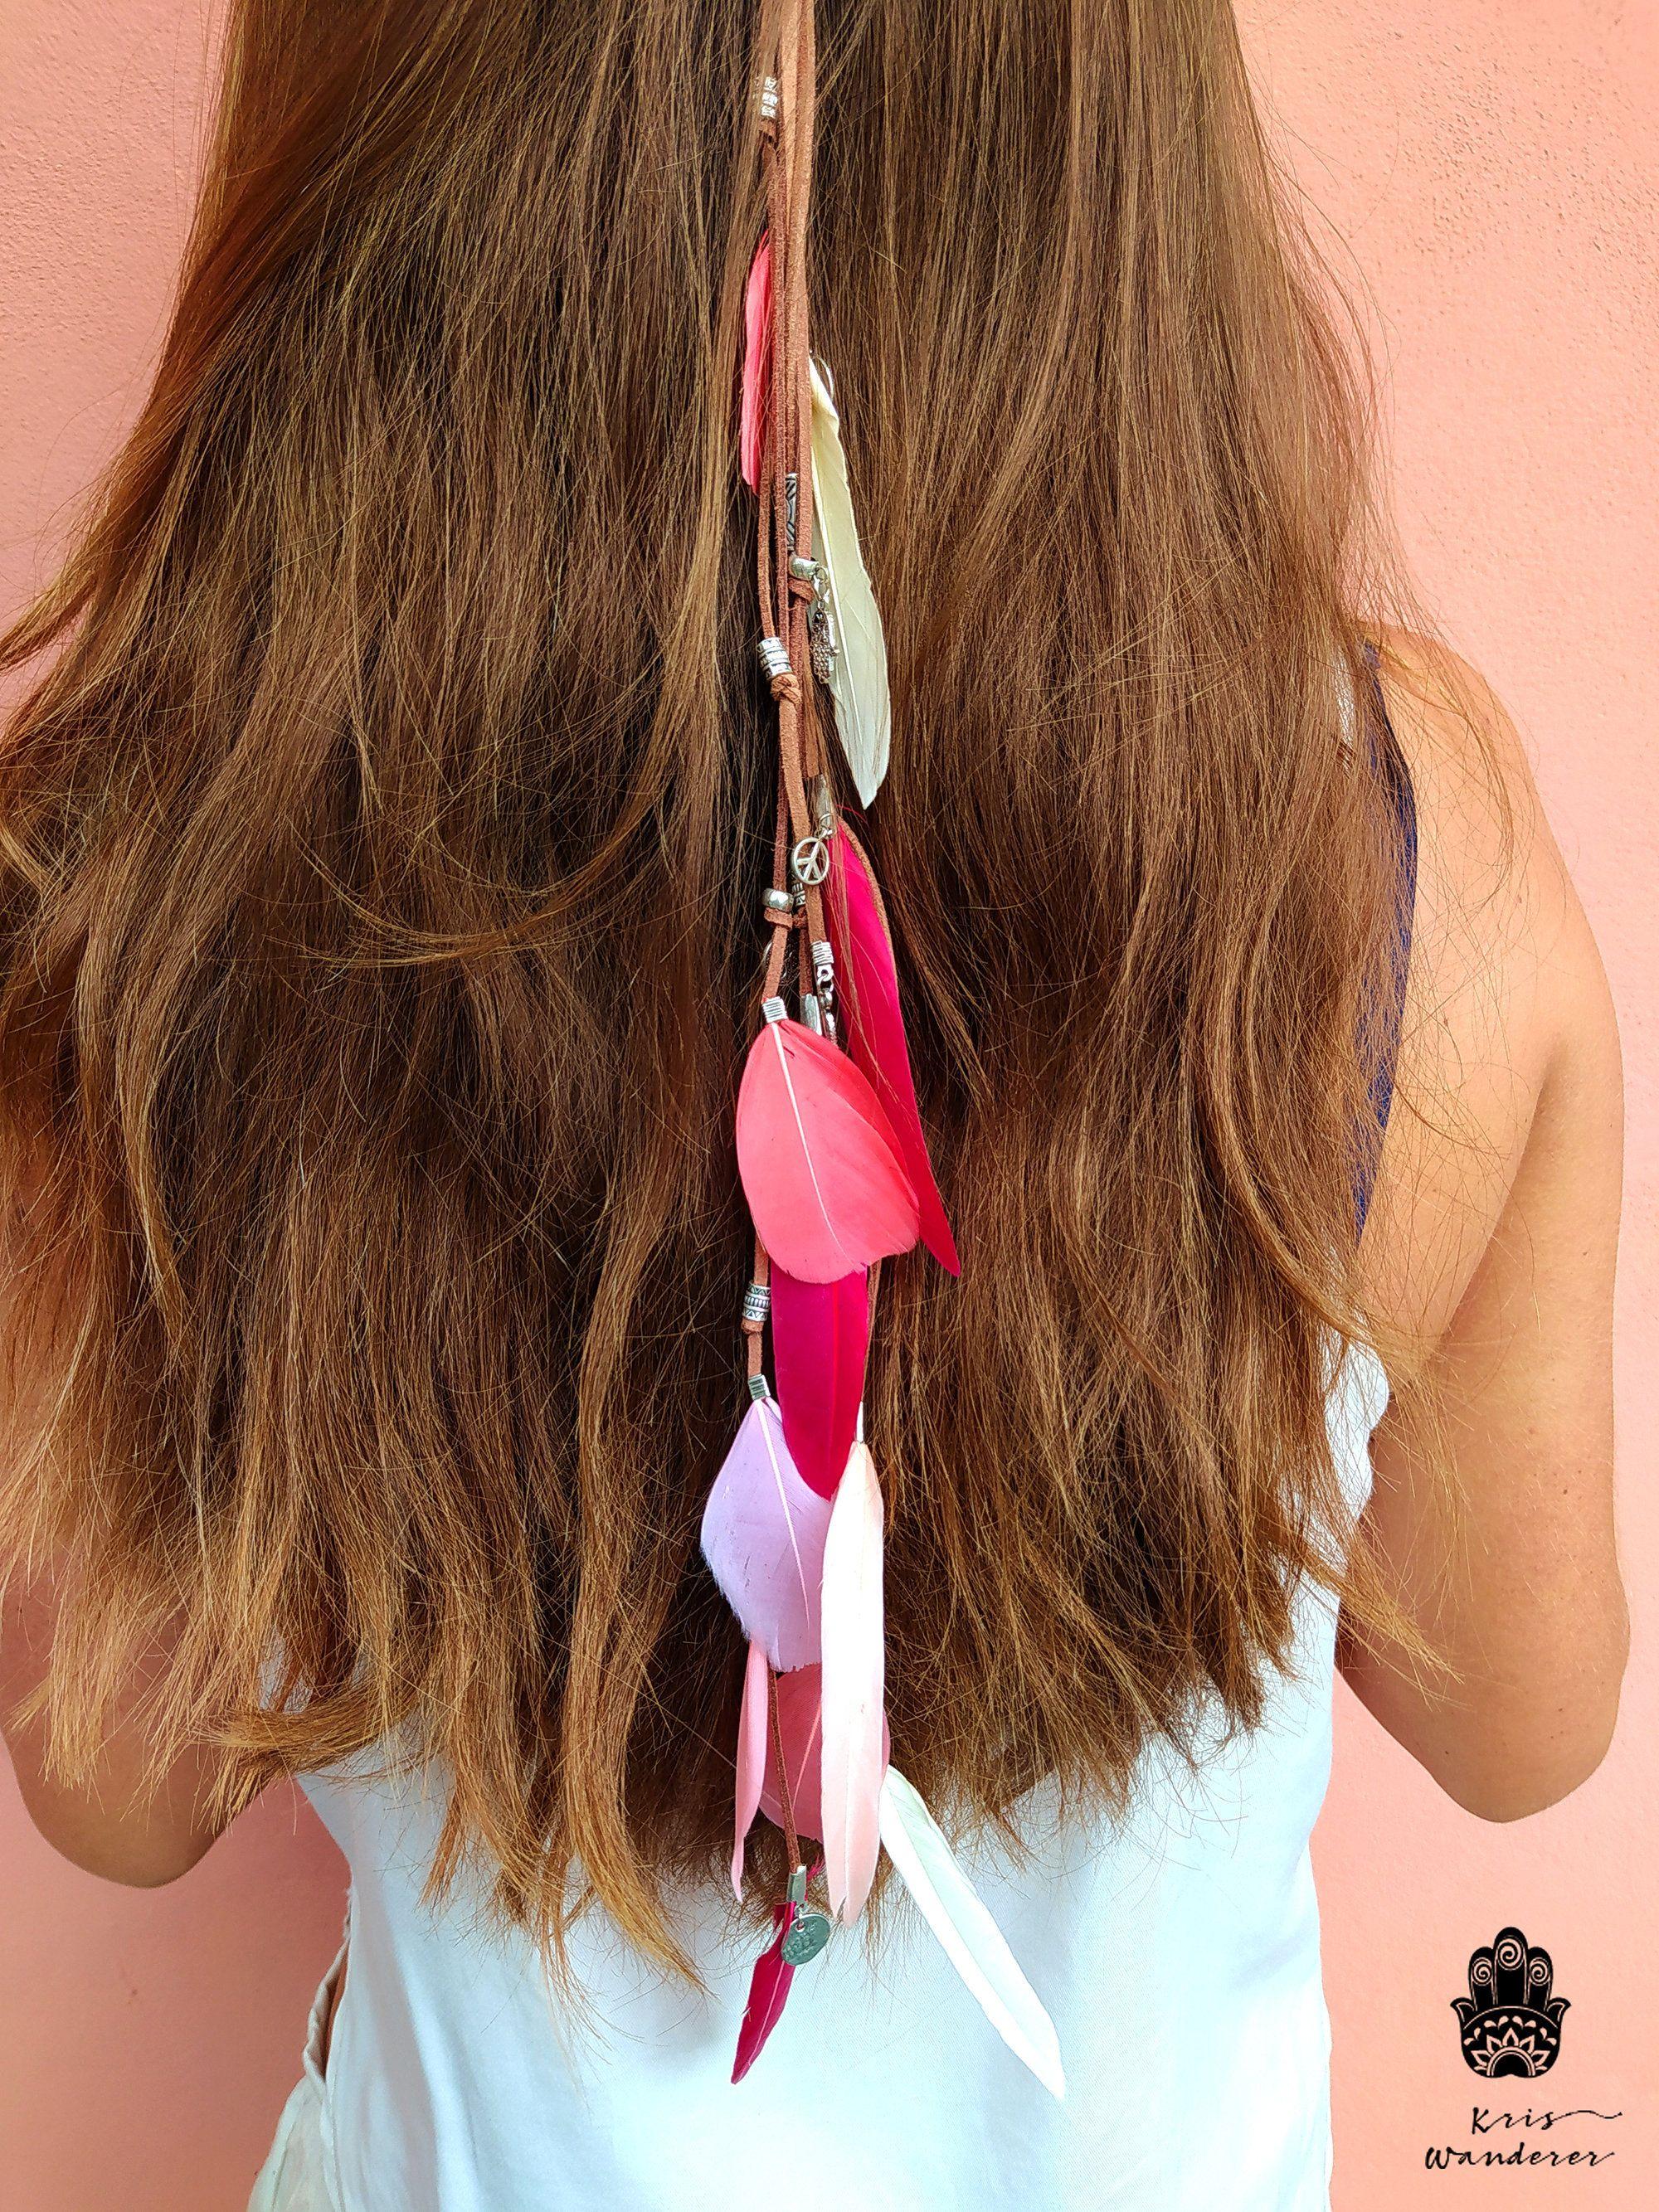 Feather hair clip Indian hair accessories Boho hair feathers Bridal hair accessories Feather hair extension clip